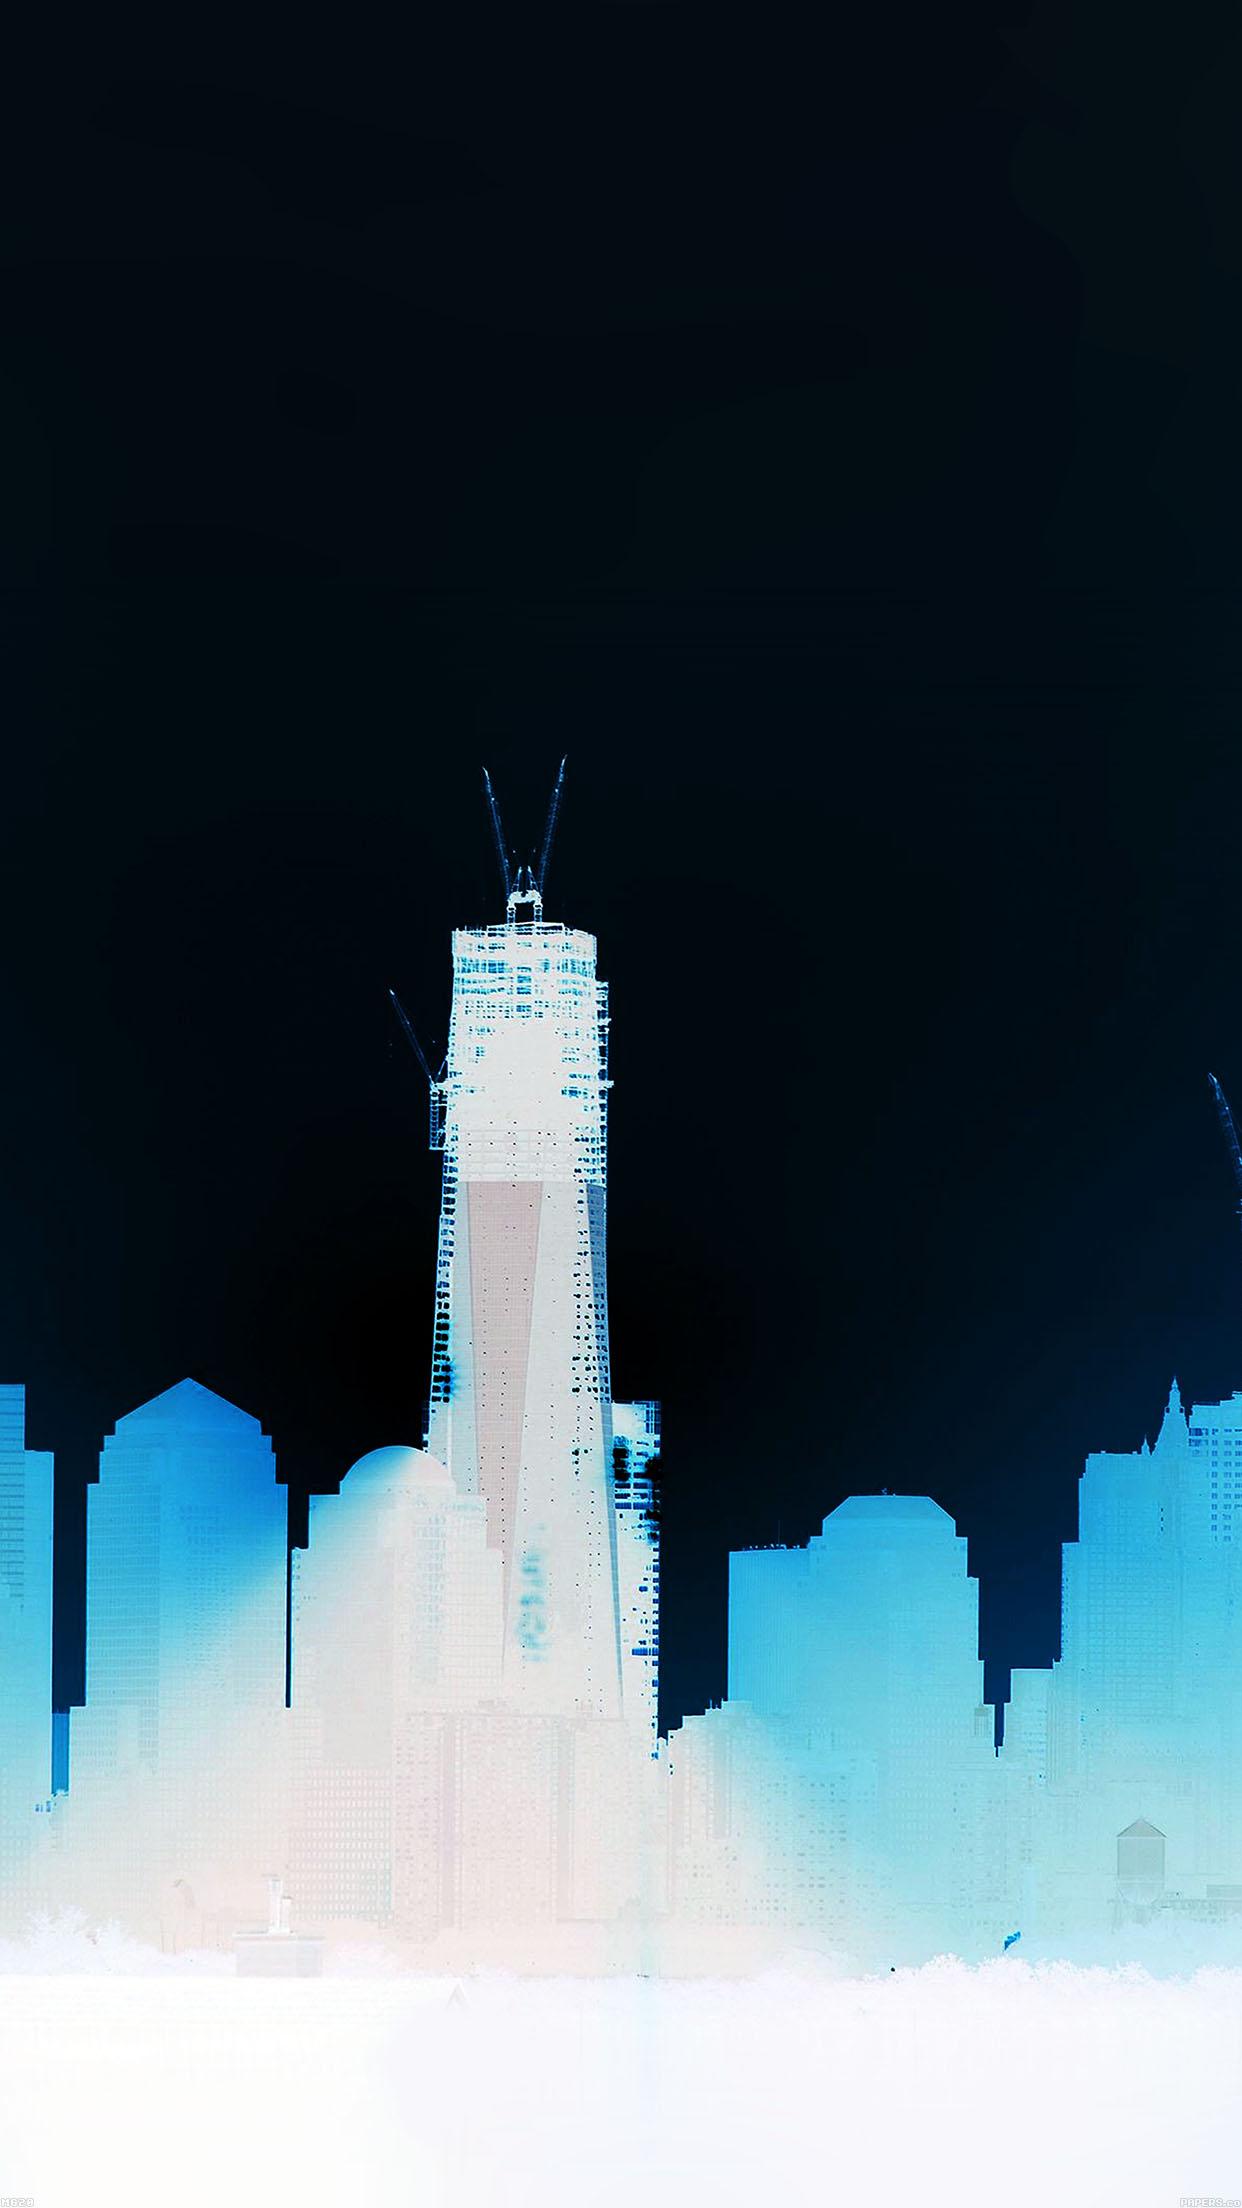 blue city iphone 6